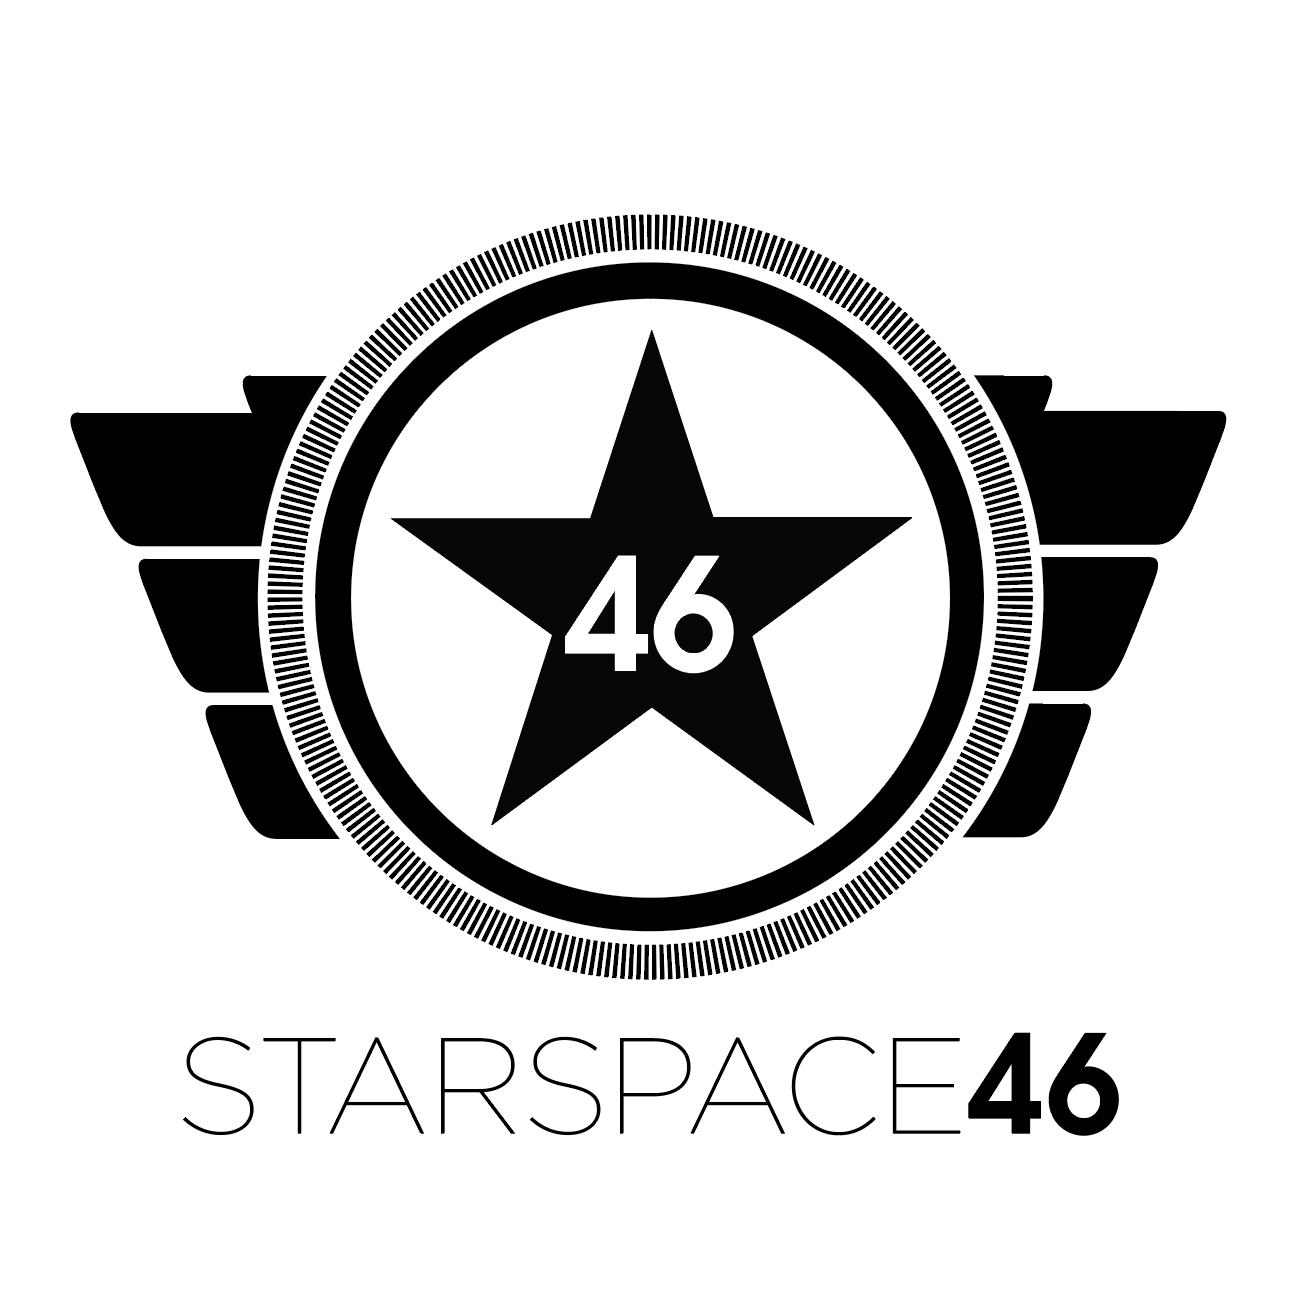 Starspace 46 Logo